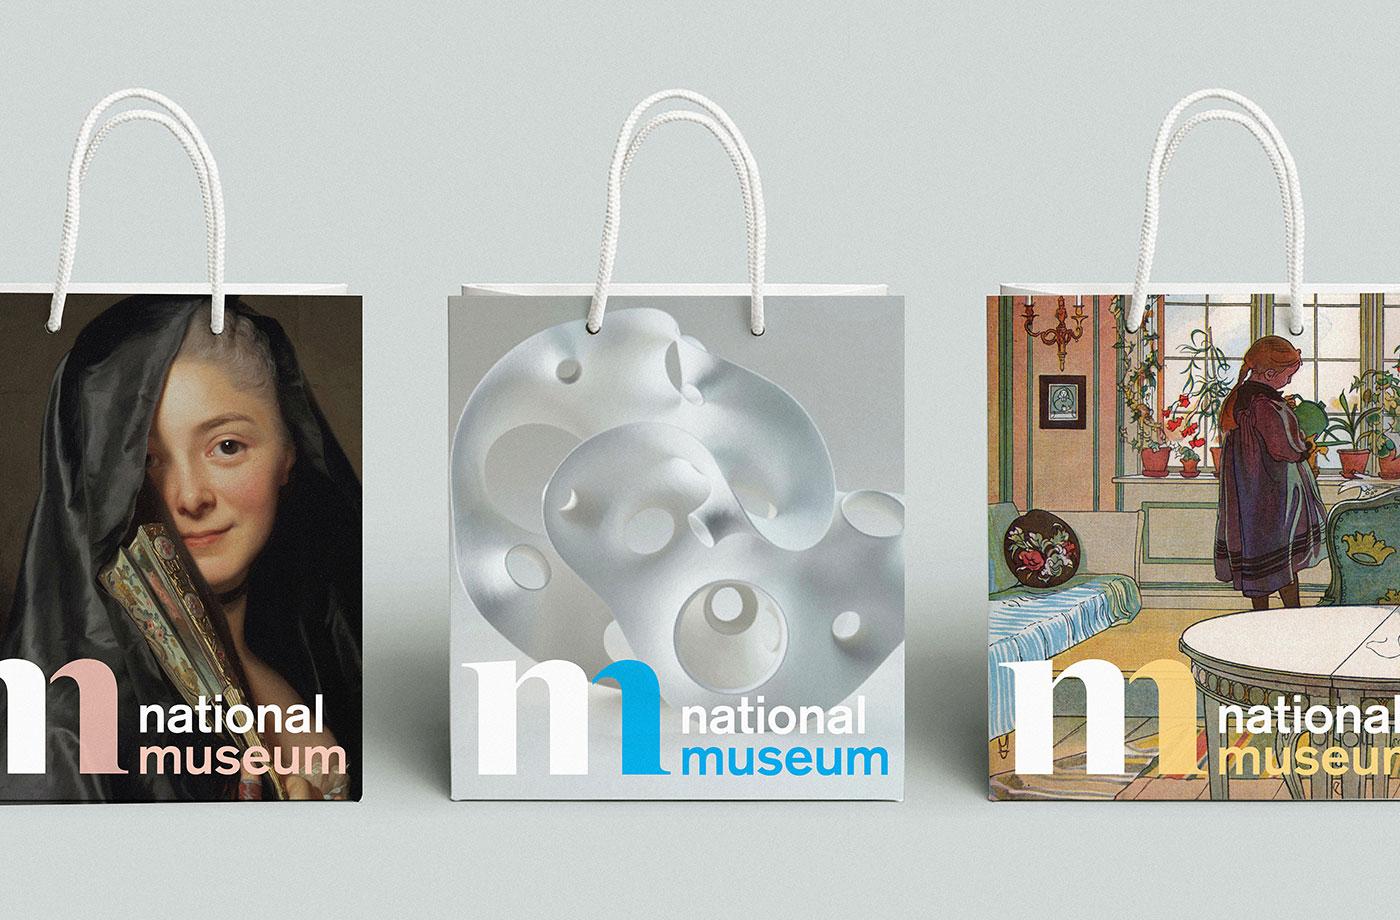 Nationalmuseum identity